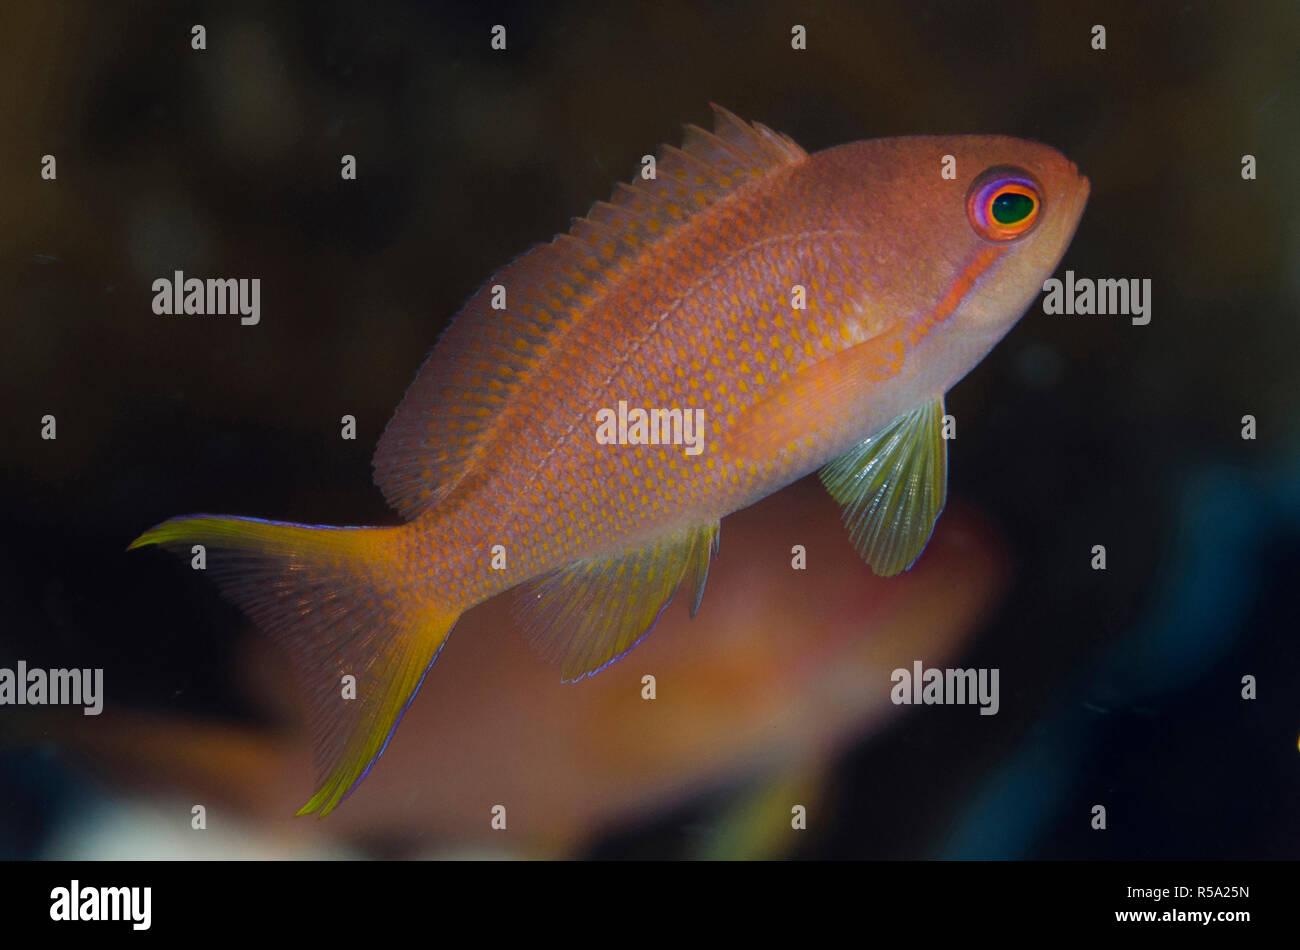 Female Scalefin Anthias, Pseudanthias squamipinnis, with fin extended, Reta Wall dive site, off Reta Island, near Alor, Indonesia, Indian Ocean - Stock Image